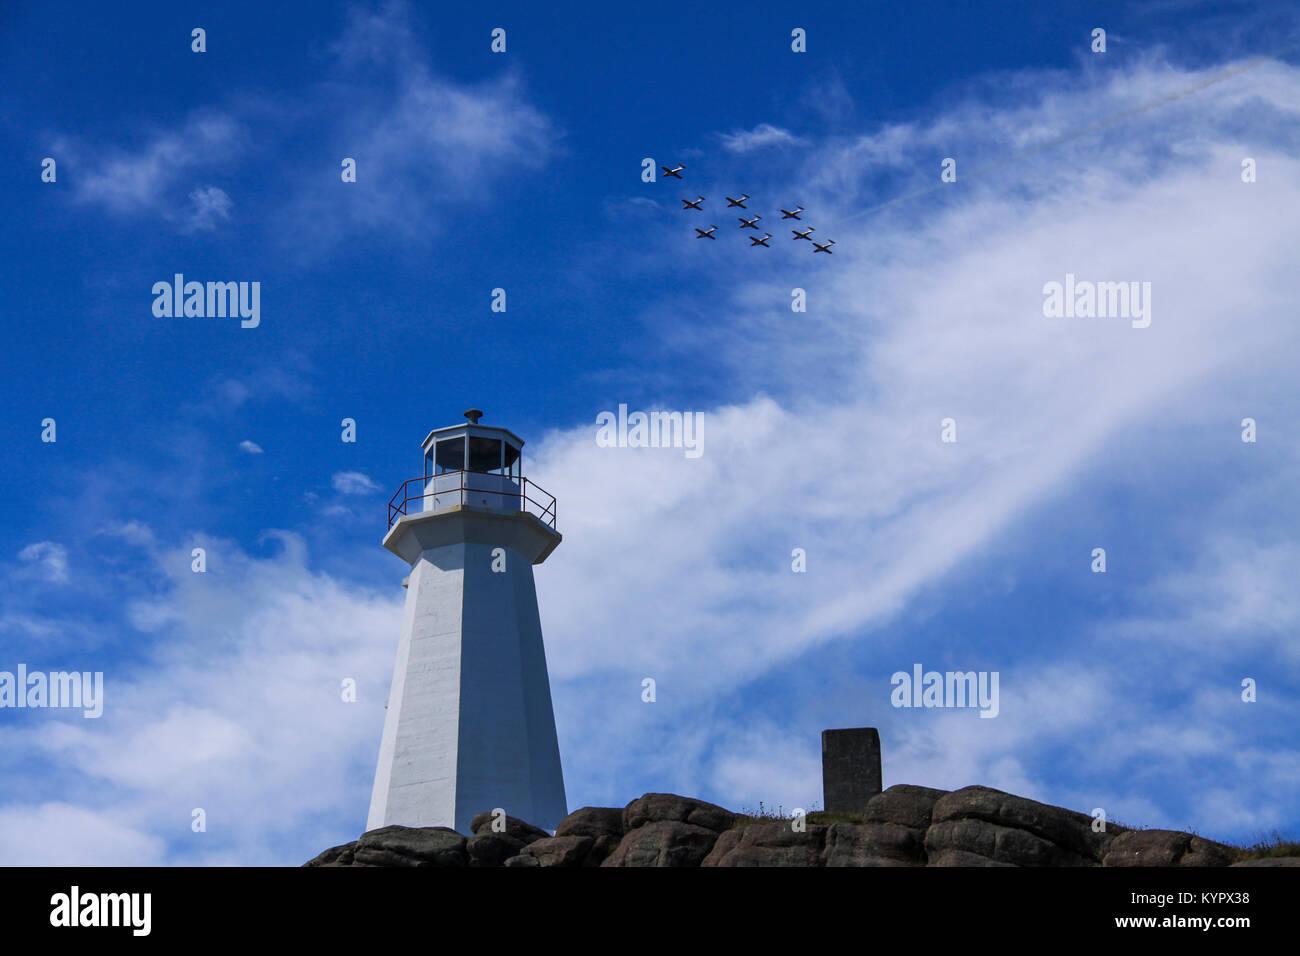 The Snowbirds fly over Cape Spear, Newfoundland. - Stock Image